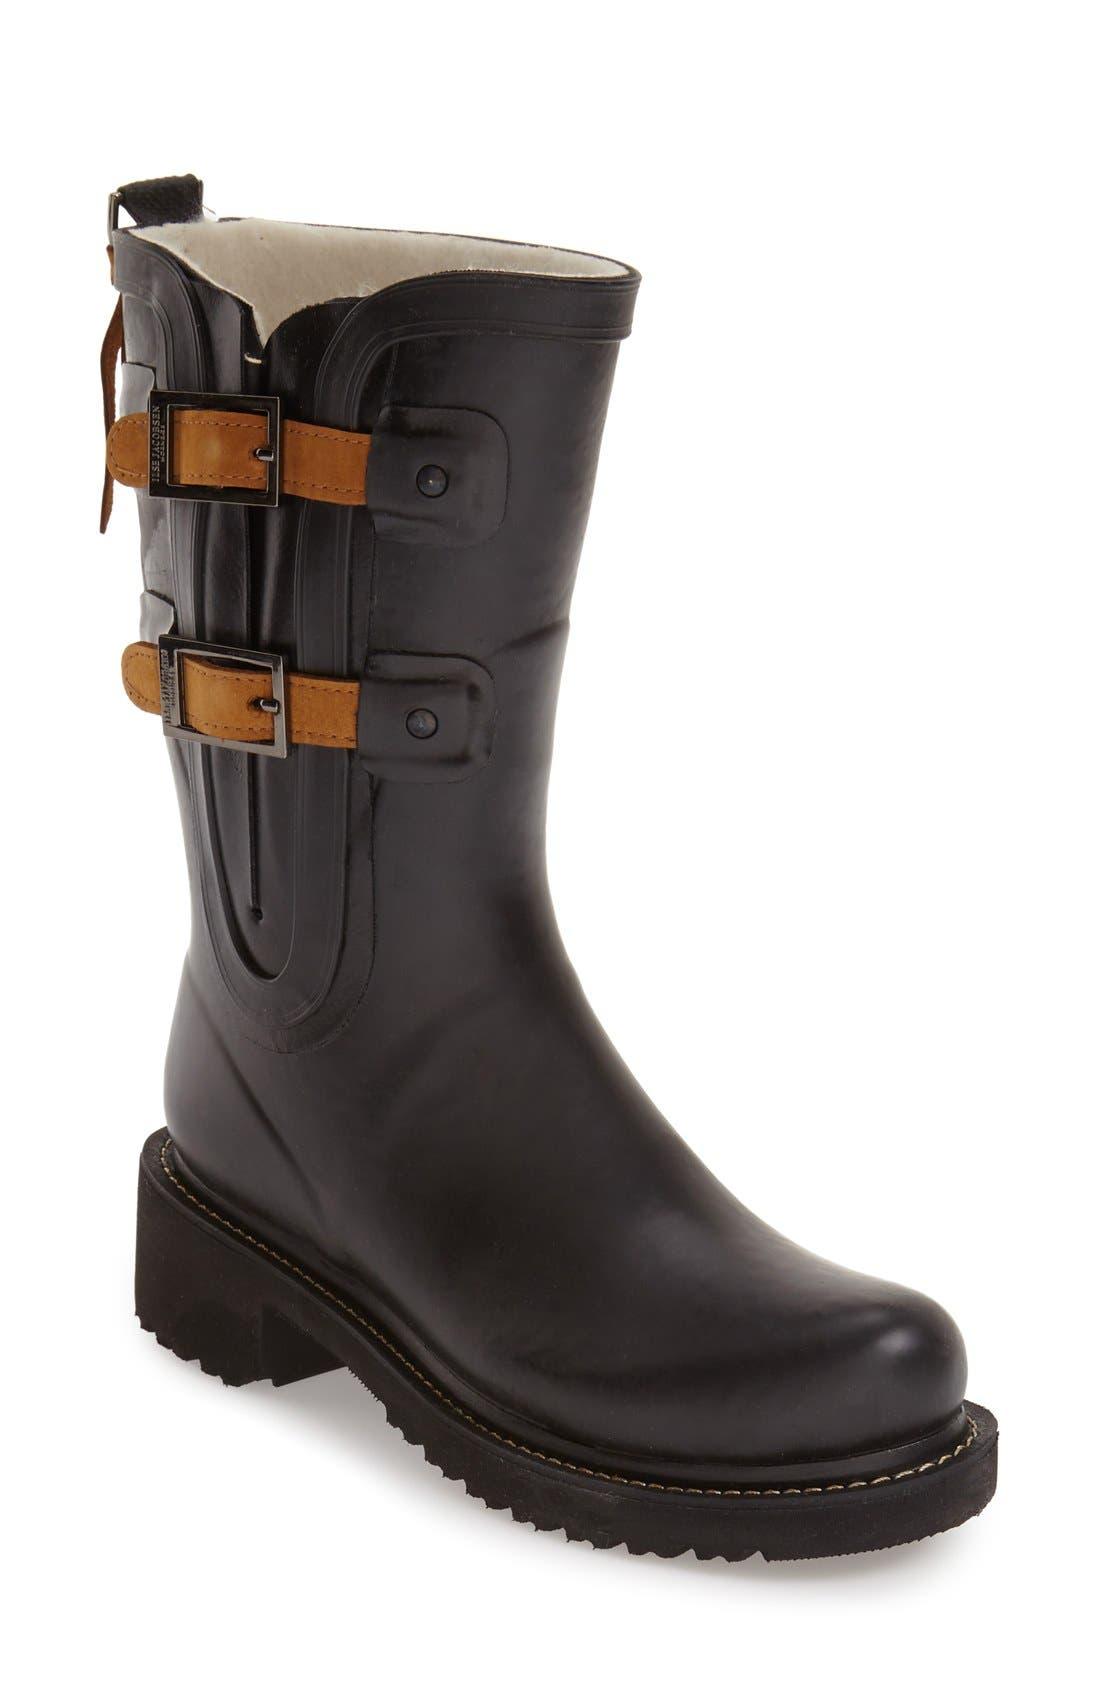 Waterproof Buckle Detail Snow/Rain Boot, Main, color, BLACK